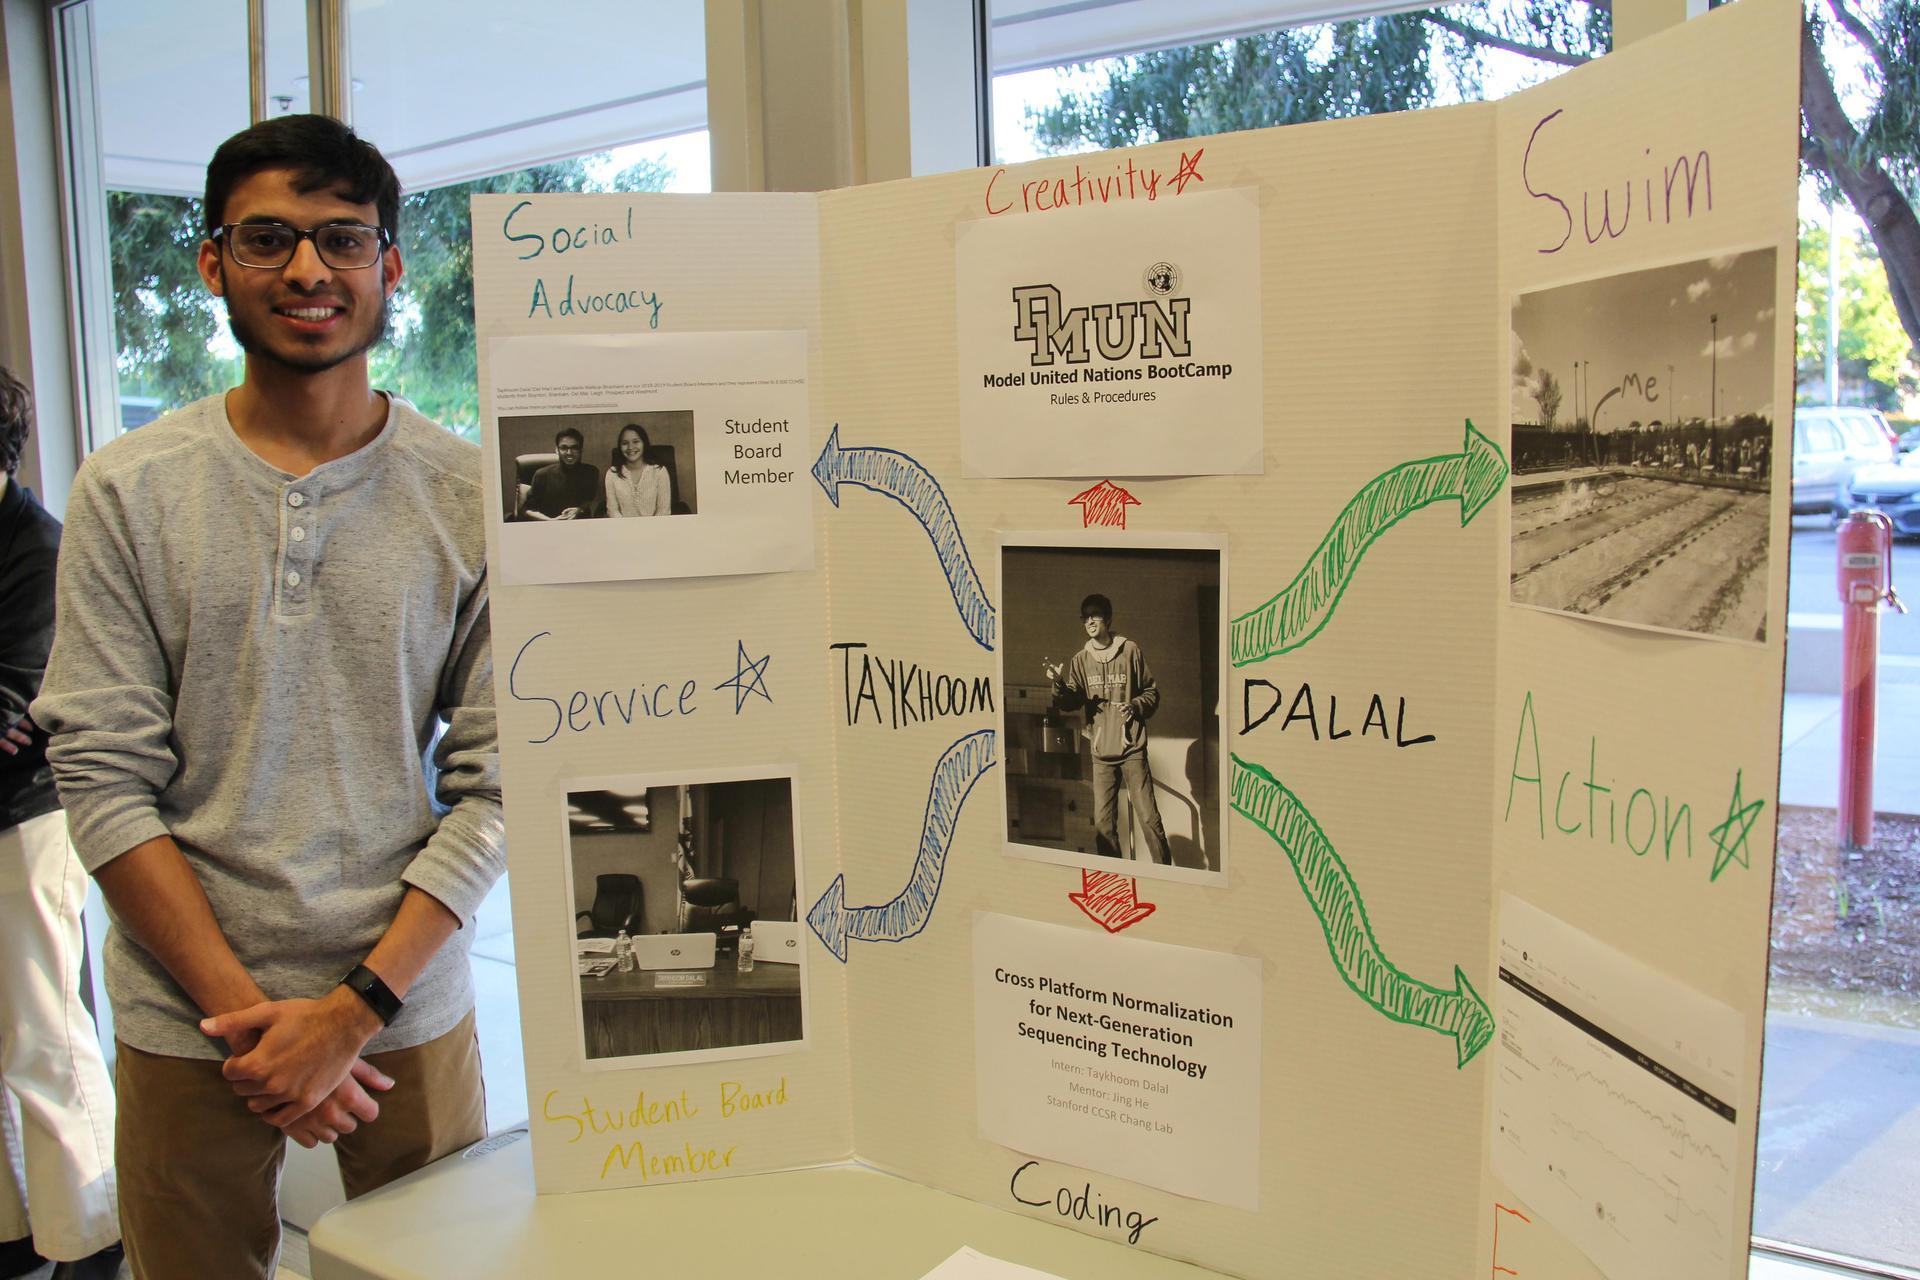 Image of IB Student - Taykhoom - showcasing his Creativity, Activity & Service experiences